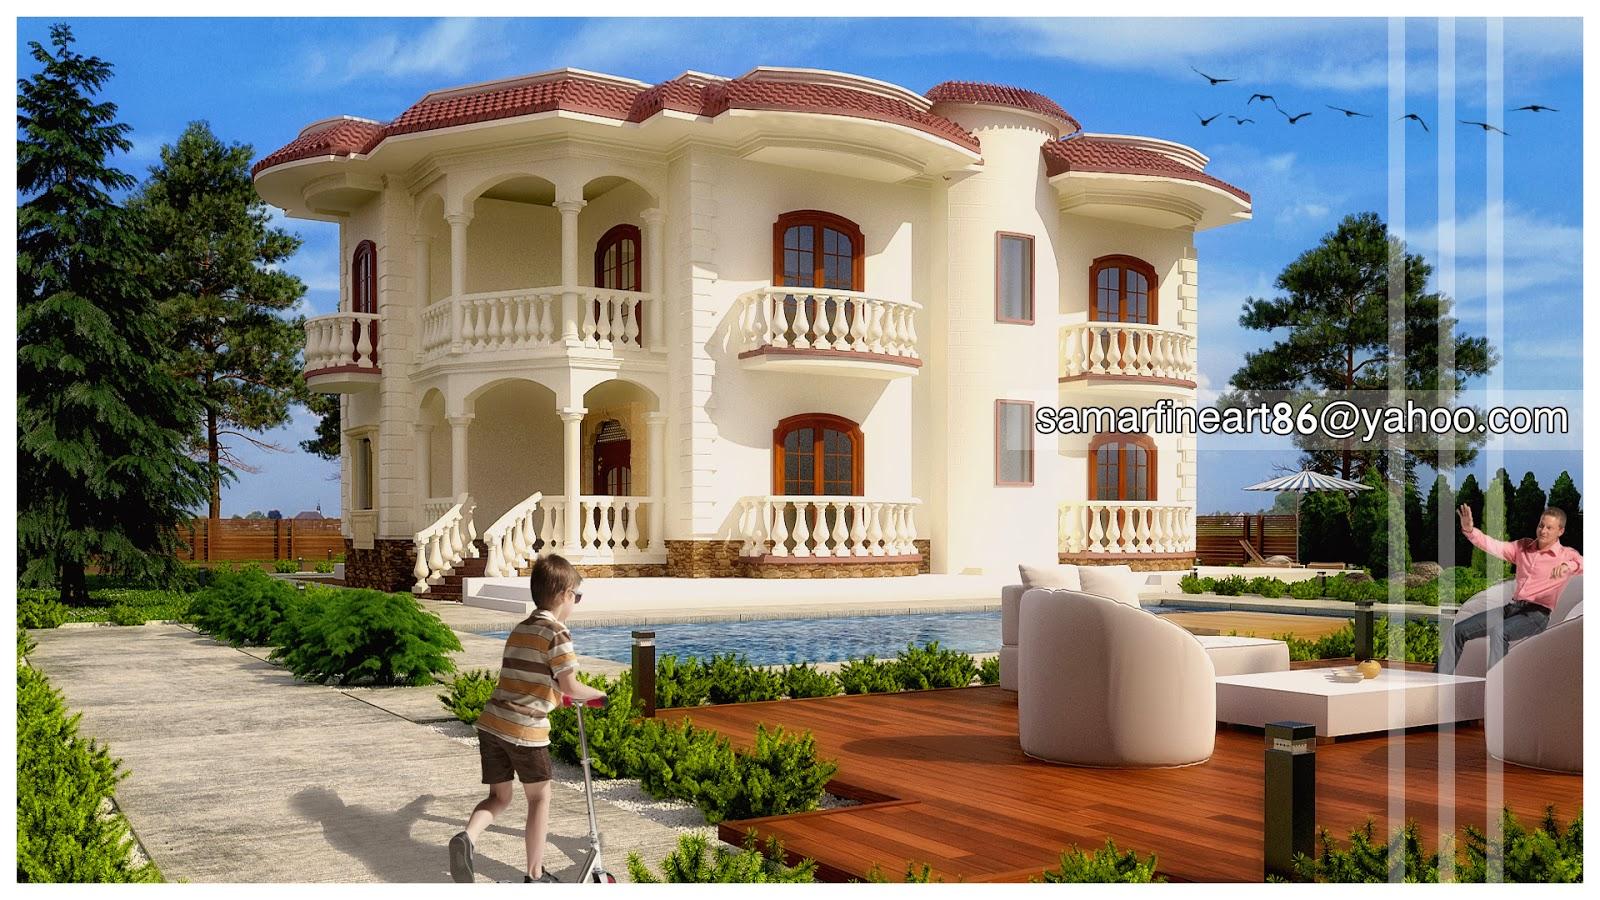 Pleasant Summer Fouad Egyptian Architect Small Villa Design Largest Home Design Picture Inspirations Pitcheantrous